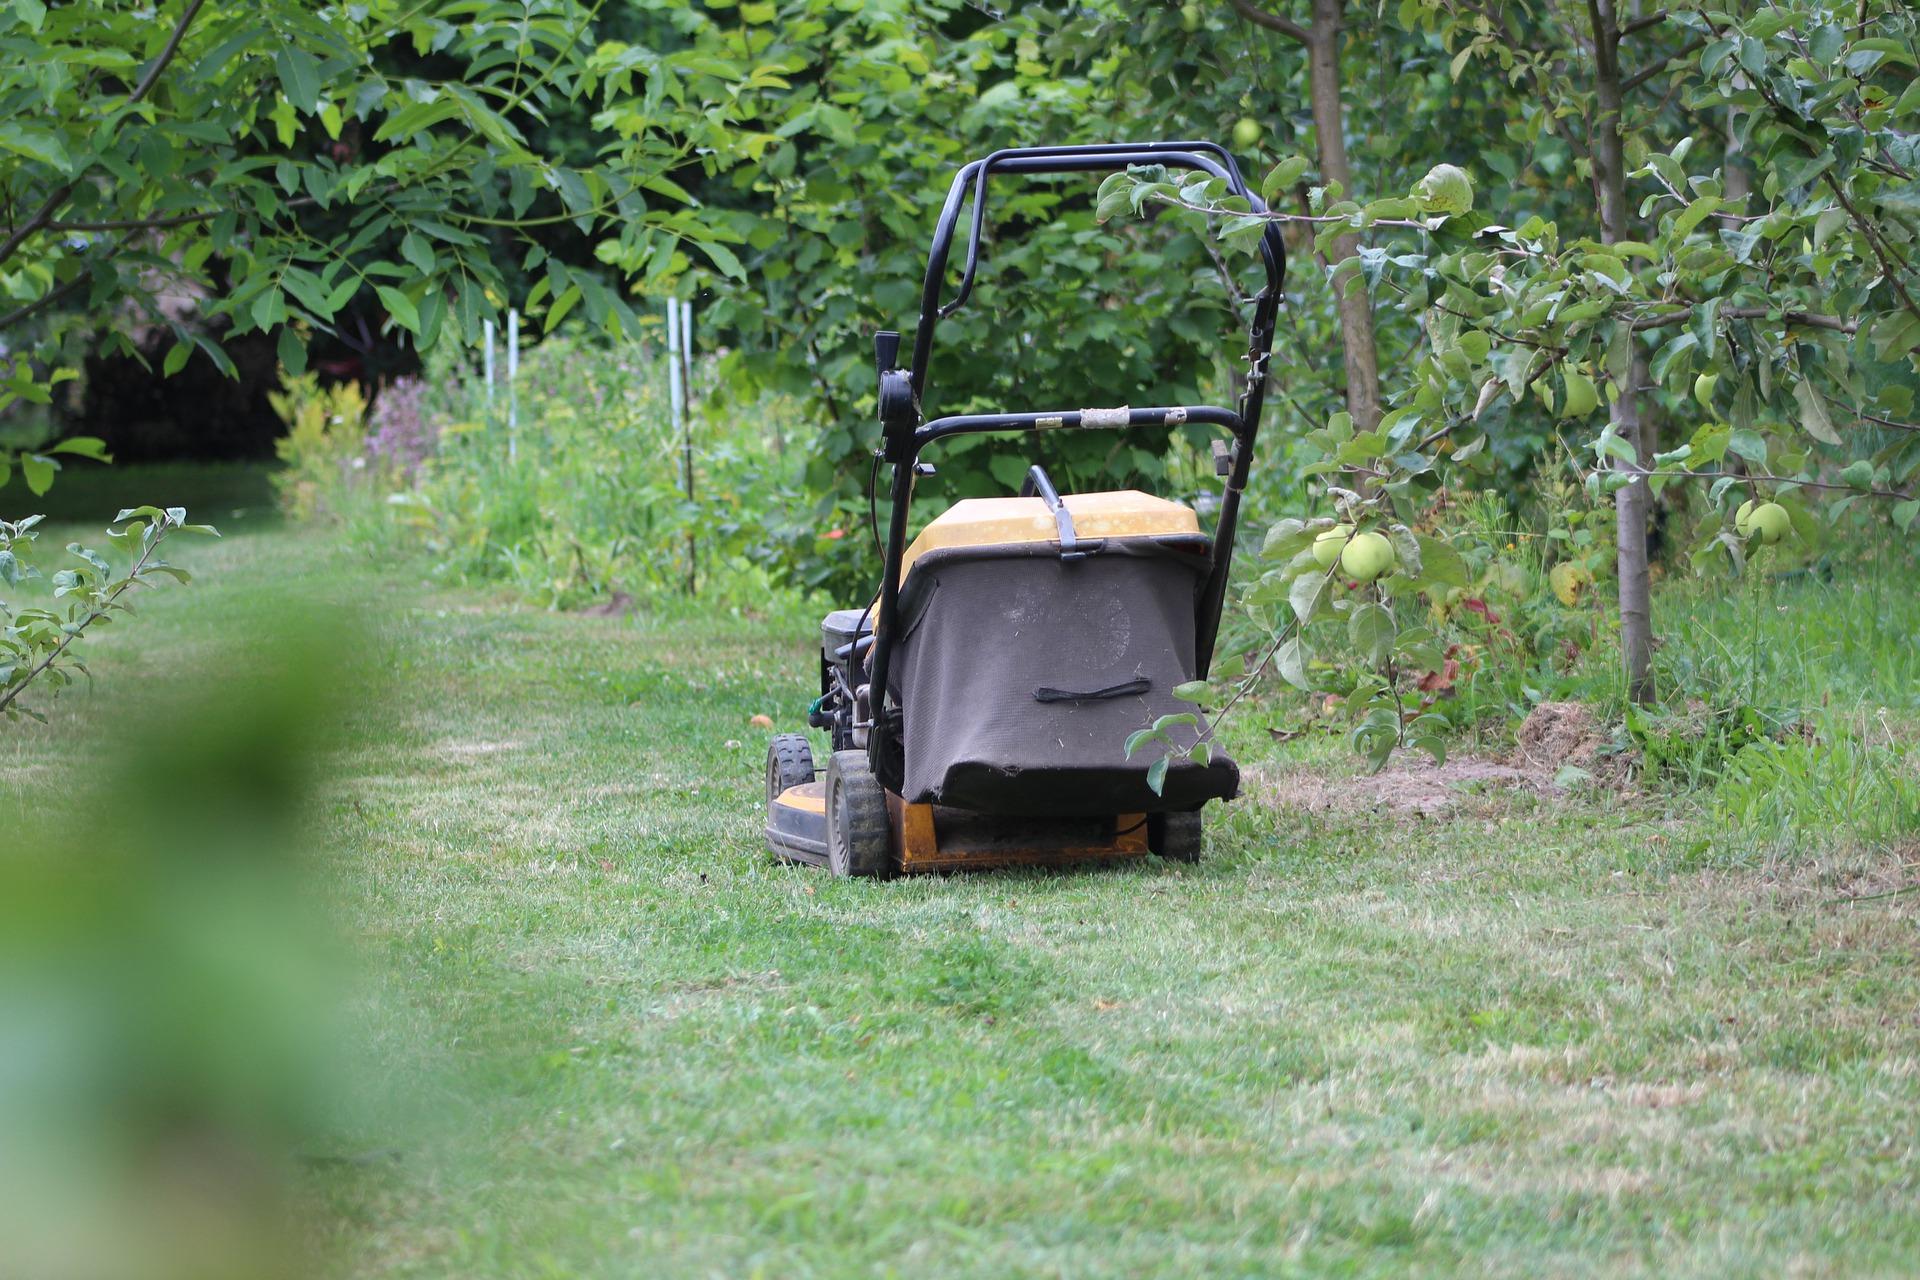 Gardener lawn mowing